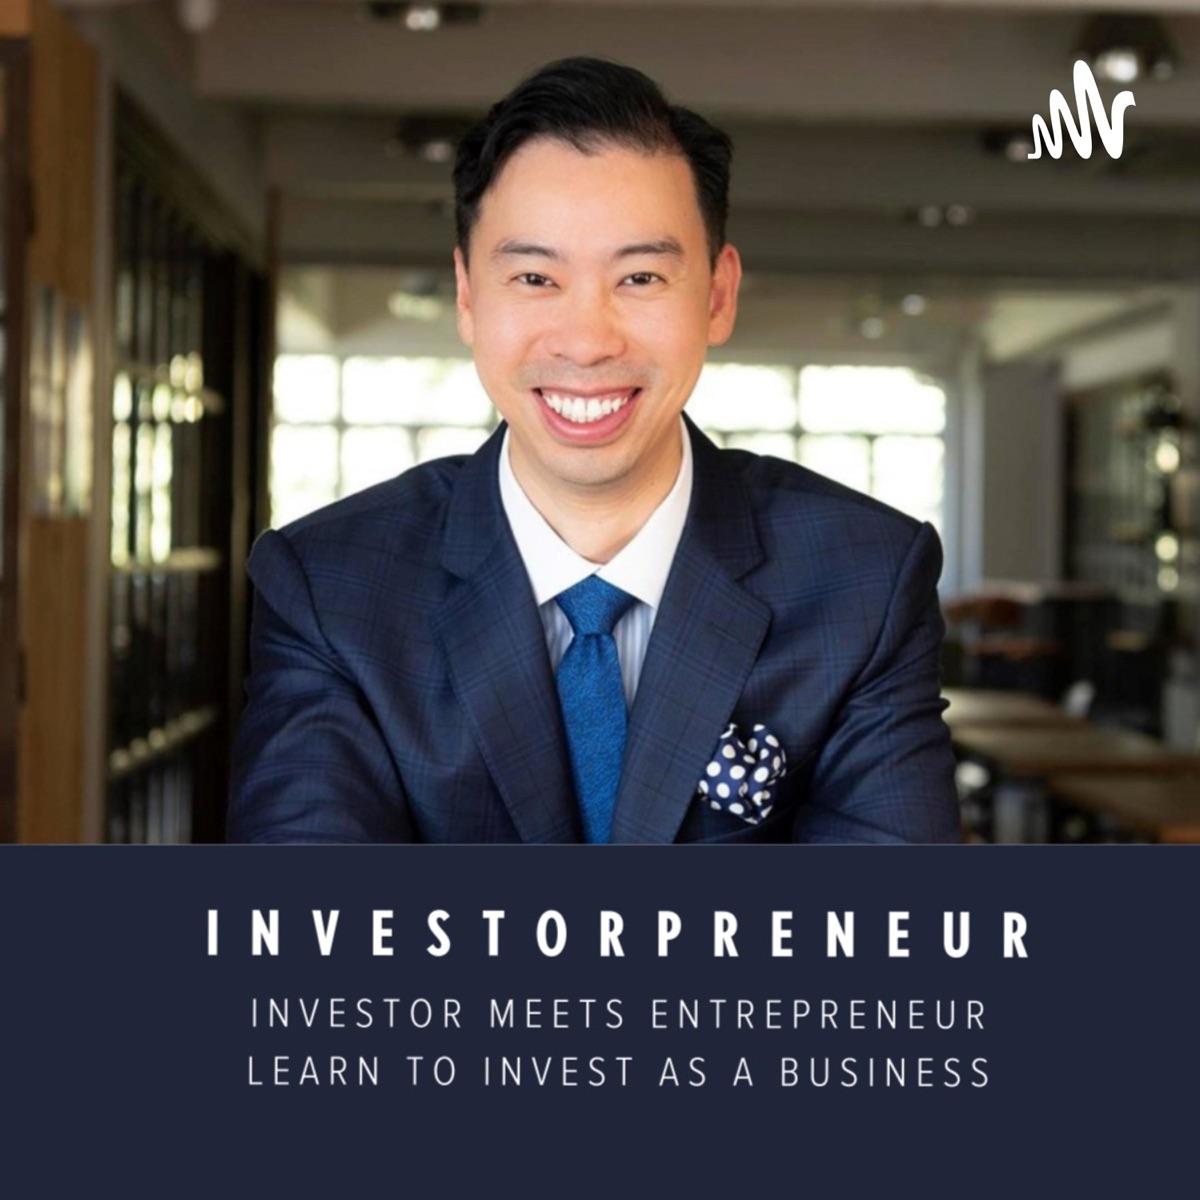 Investorpreneur